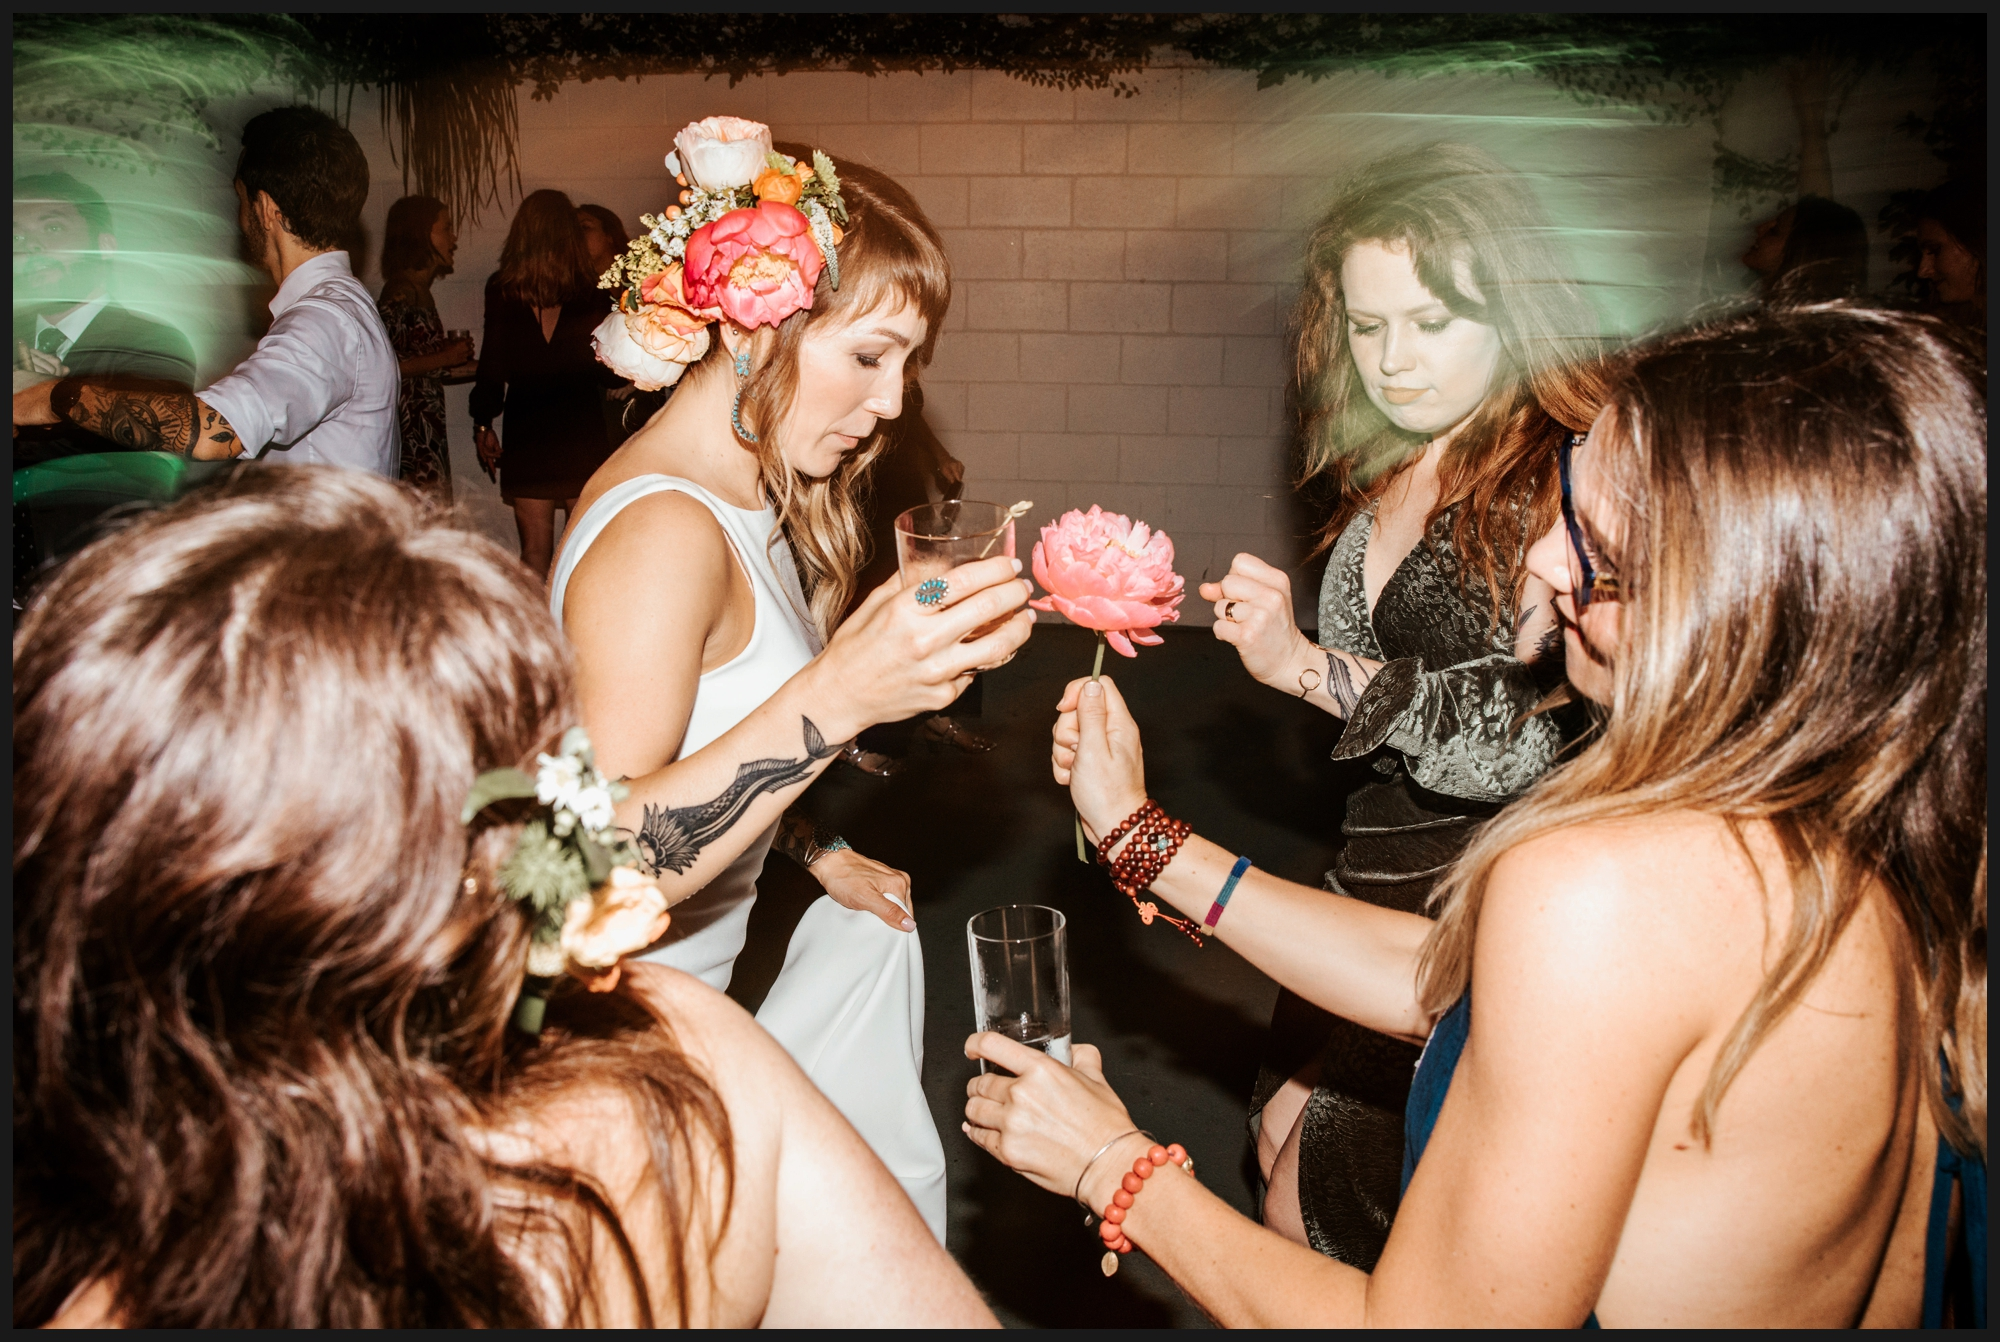 Orlando-Wedding-Photographer-destination-wedding-photographer-florida-wedding-photographer-bohemian-wedding-photographer_2055.jpg